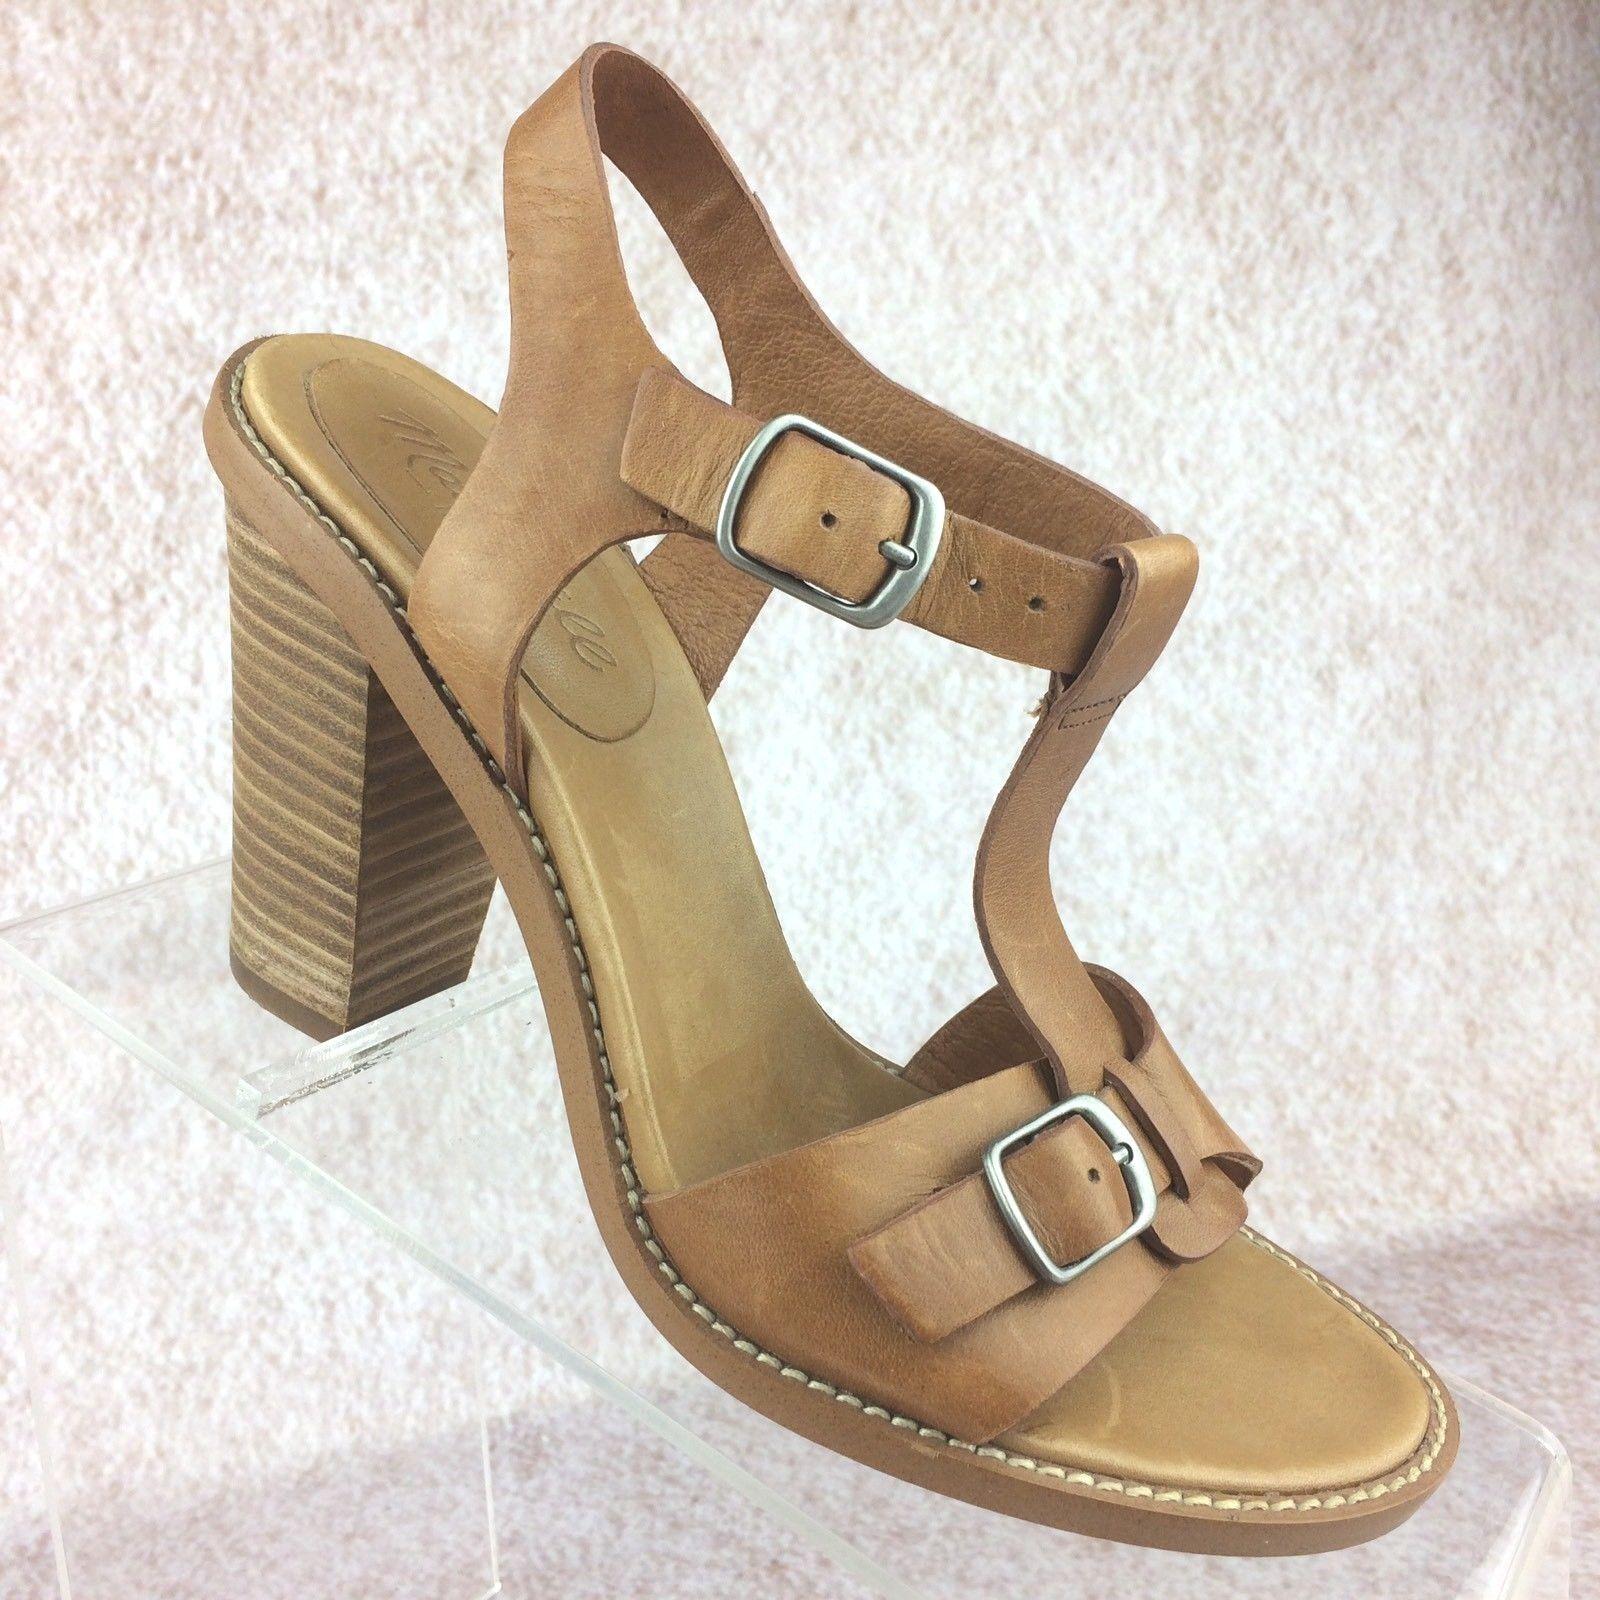 Madewell The Loren Heel T-Strap High Heel Sandale Tan Cognac Braun Größe 5.5 US